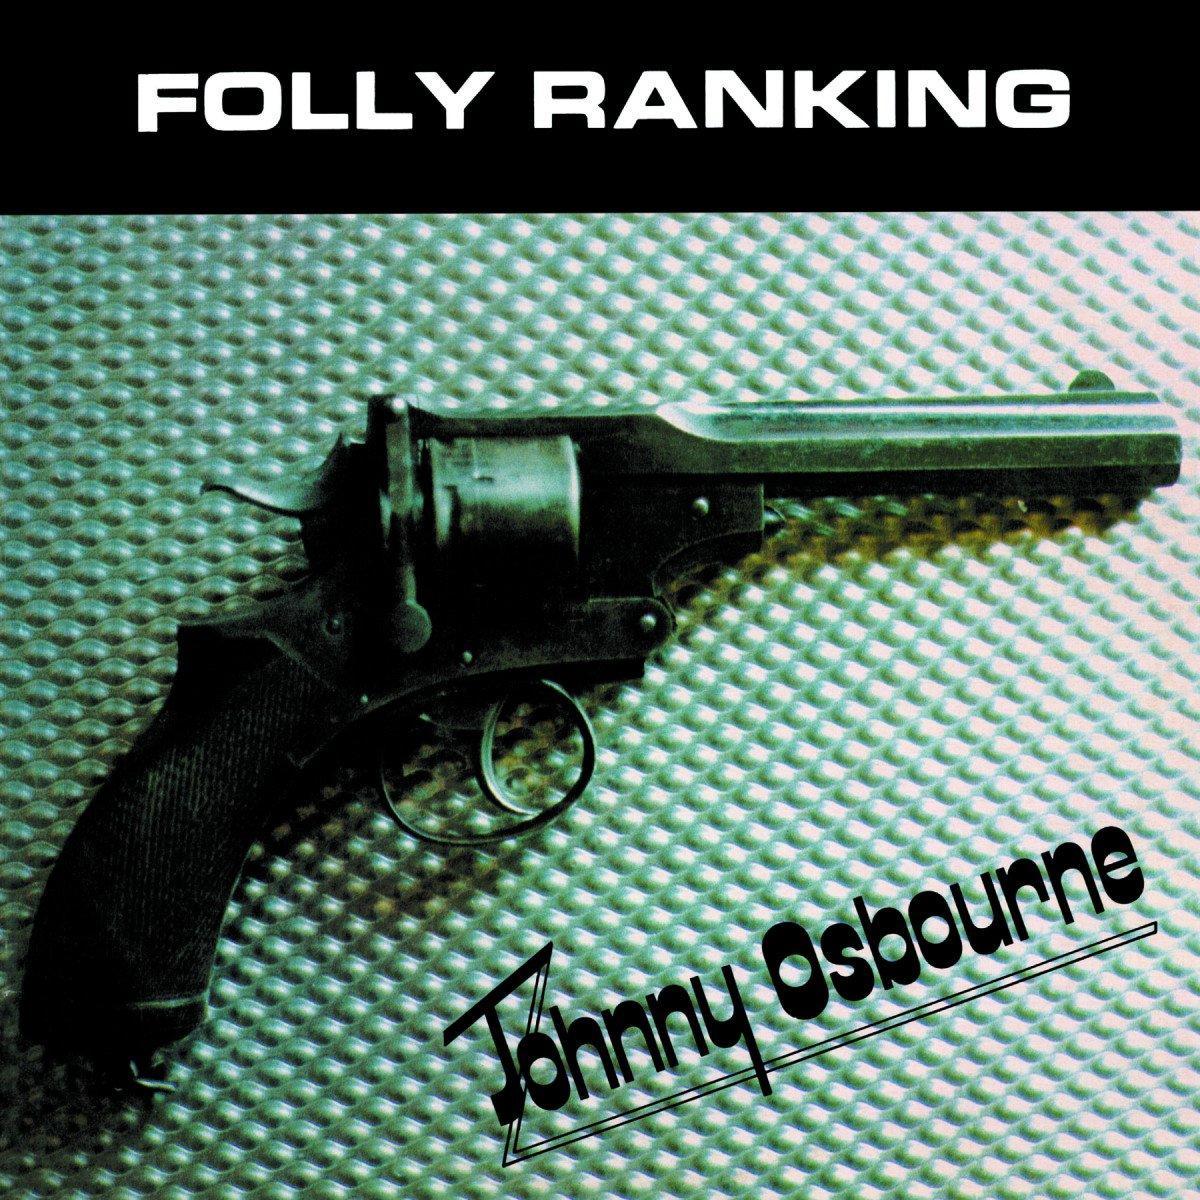 Vinilo : Johnny Osbourne - Folly Ranking (LP Vinyl)